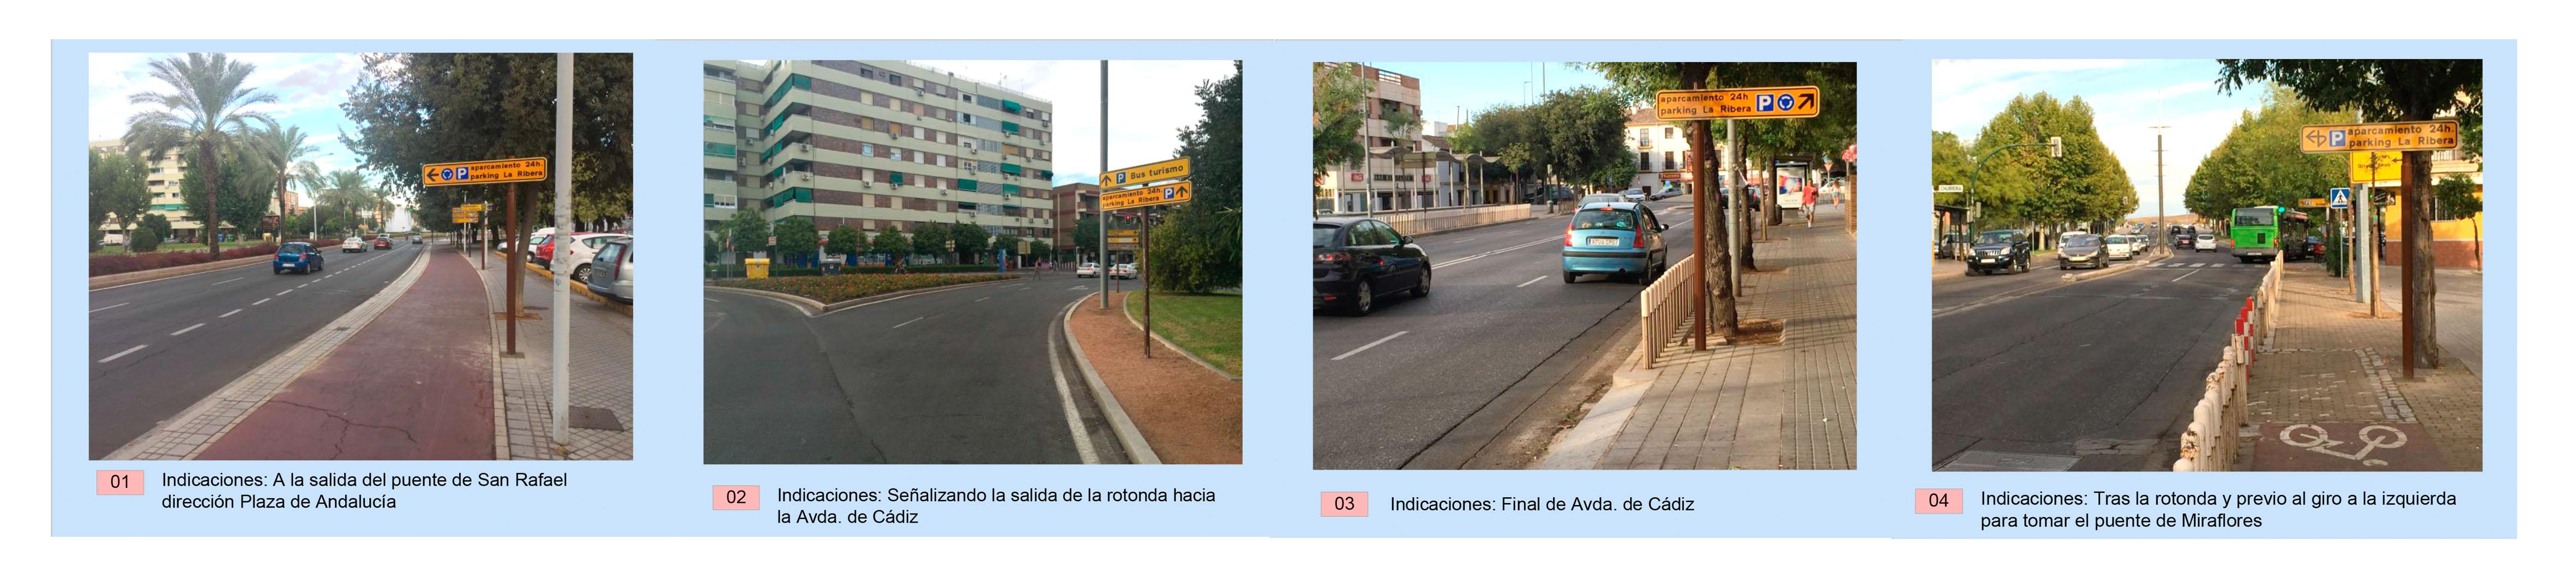 Visio-Acceso_desdeA4.vsd